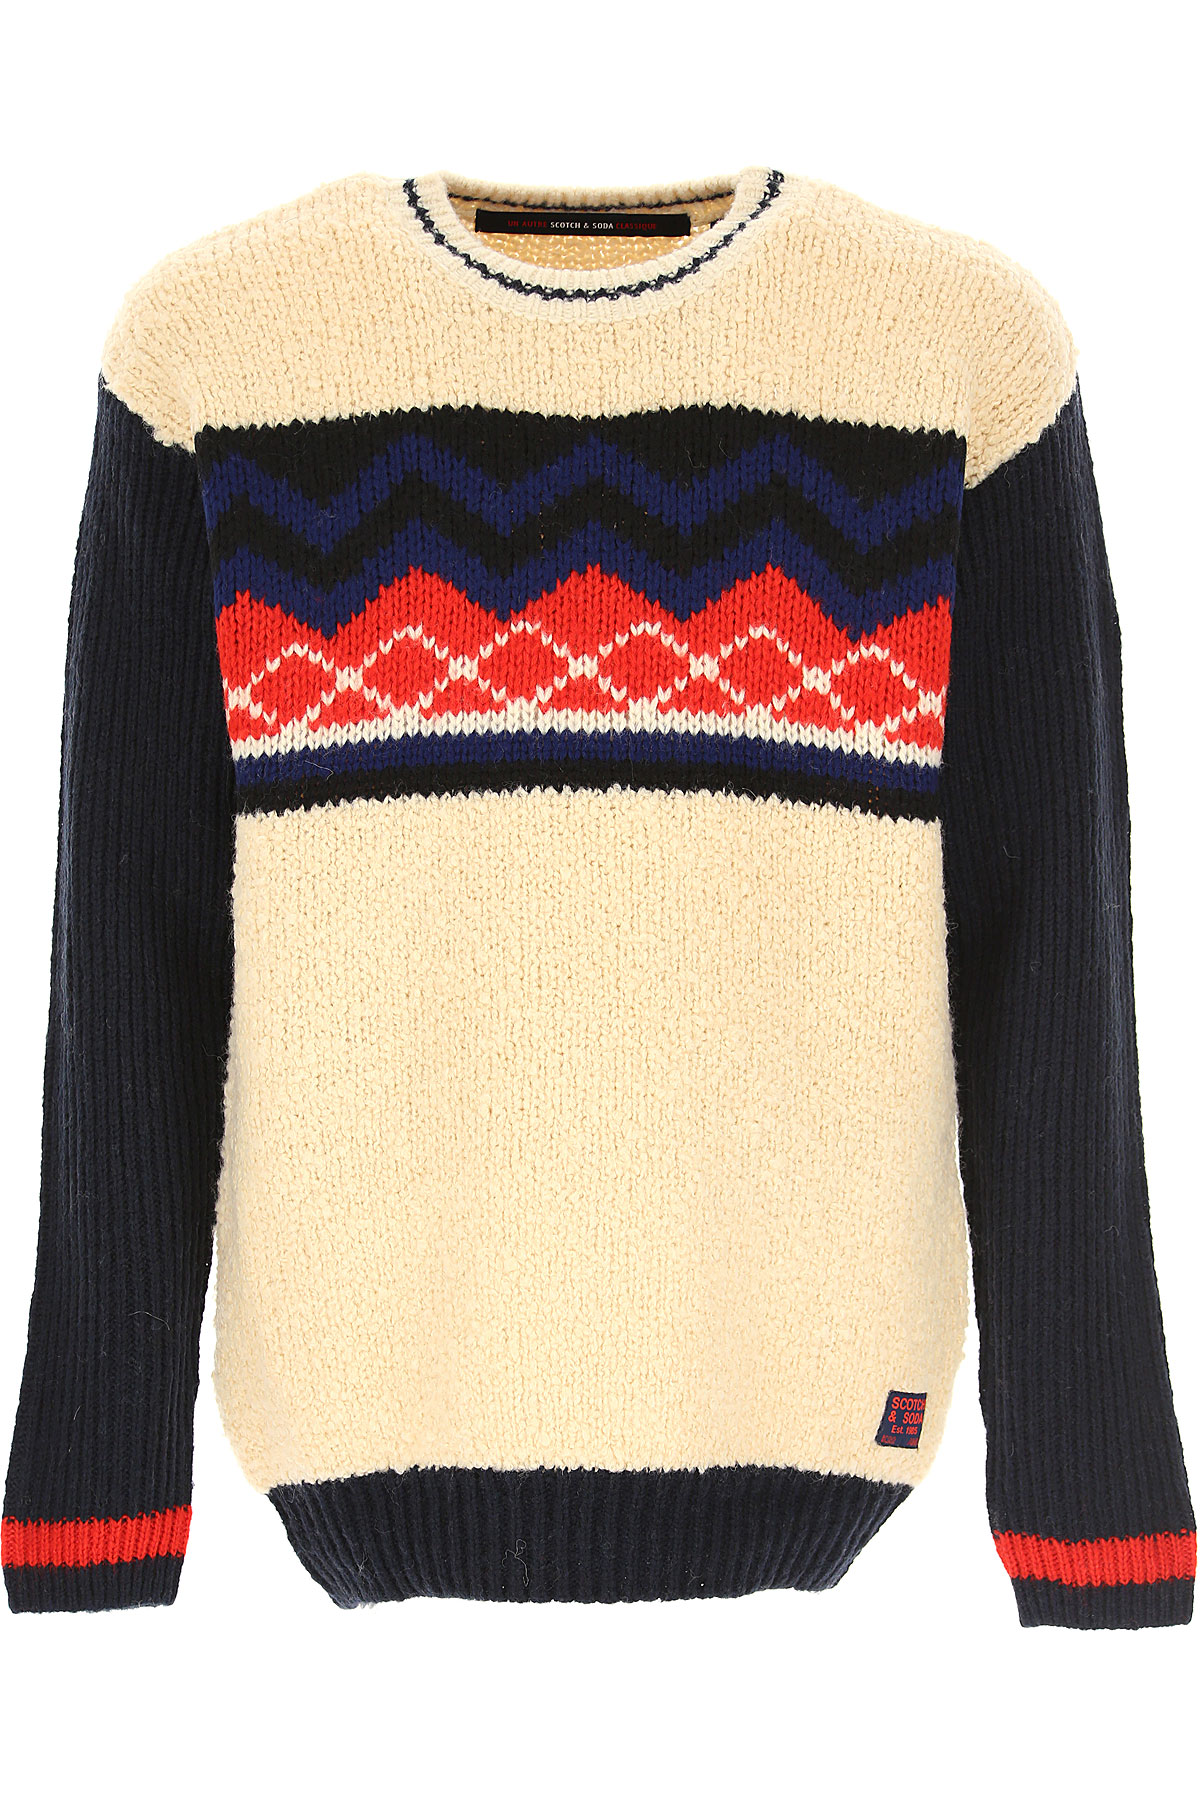 Scotch & Soda Sweater for Men Jumper On Sale, Ivory, Acrylic, 2019, L M S XL